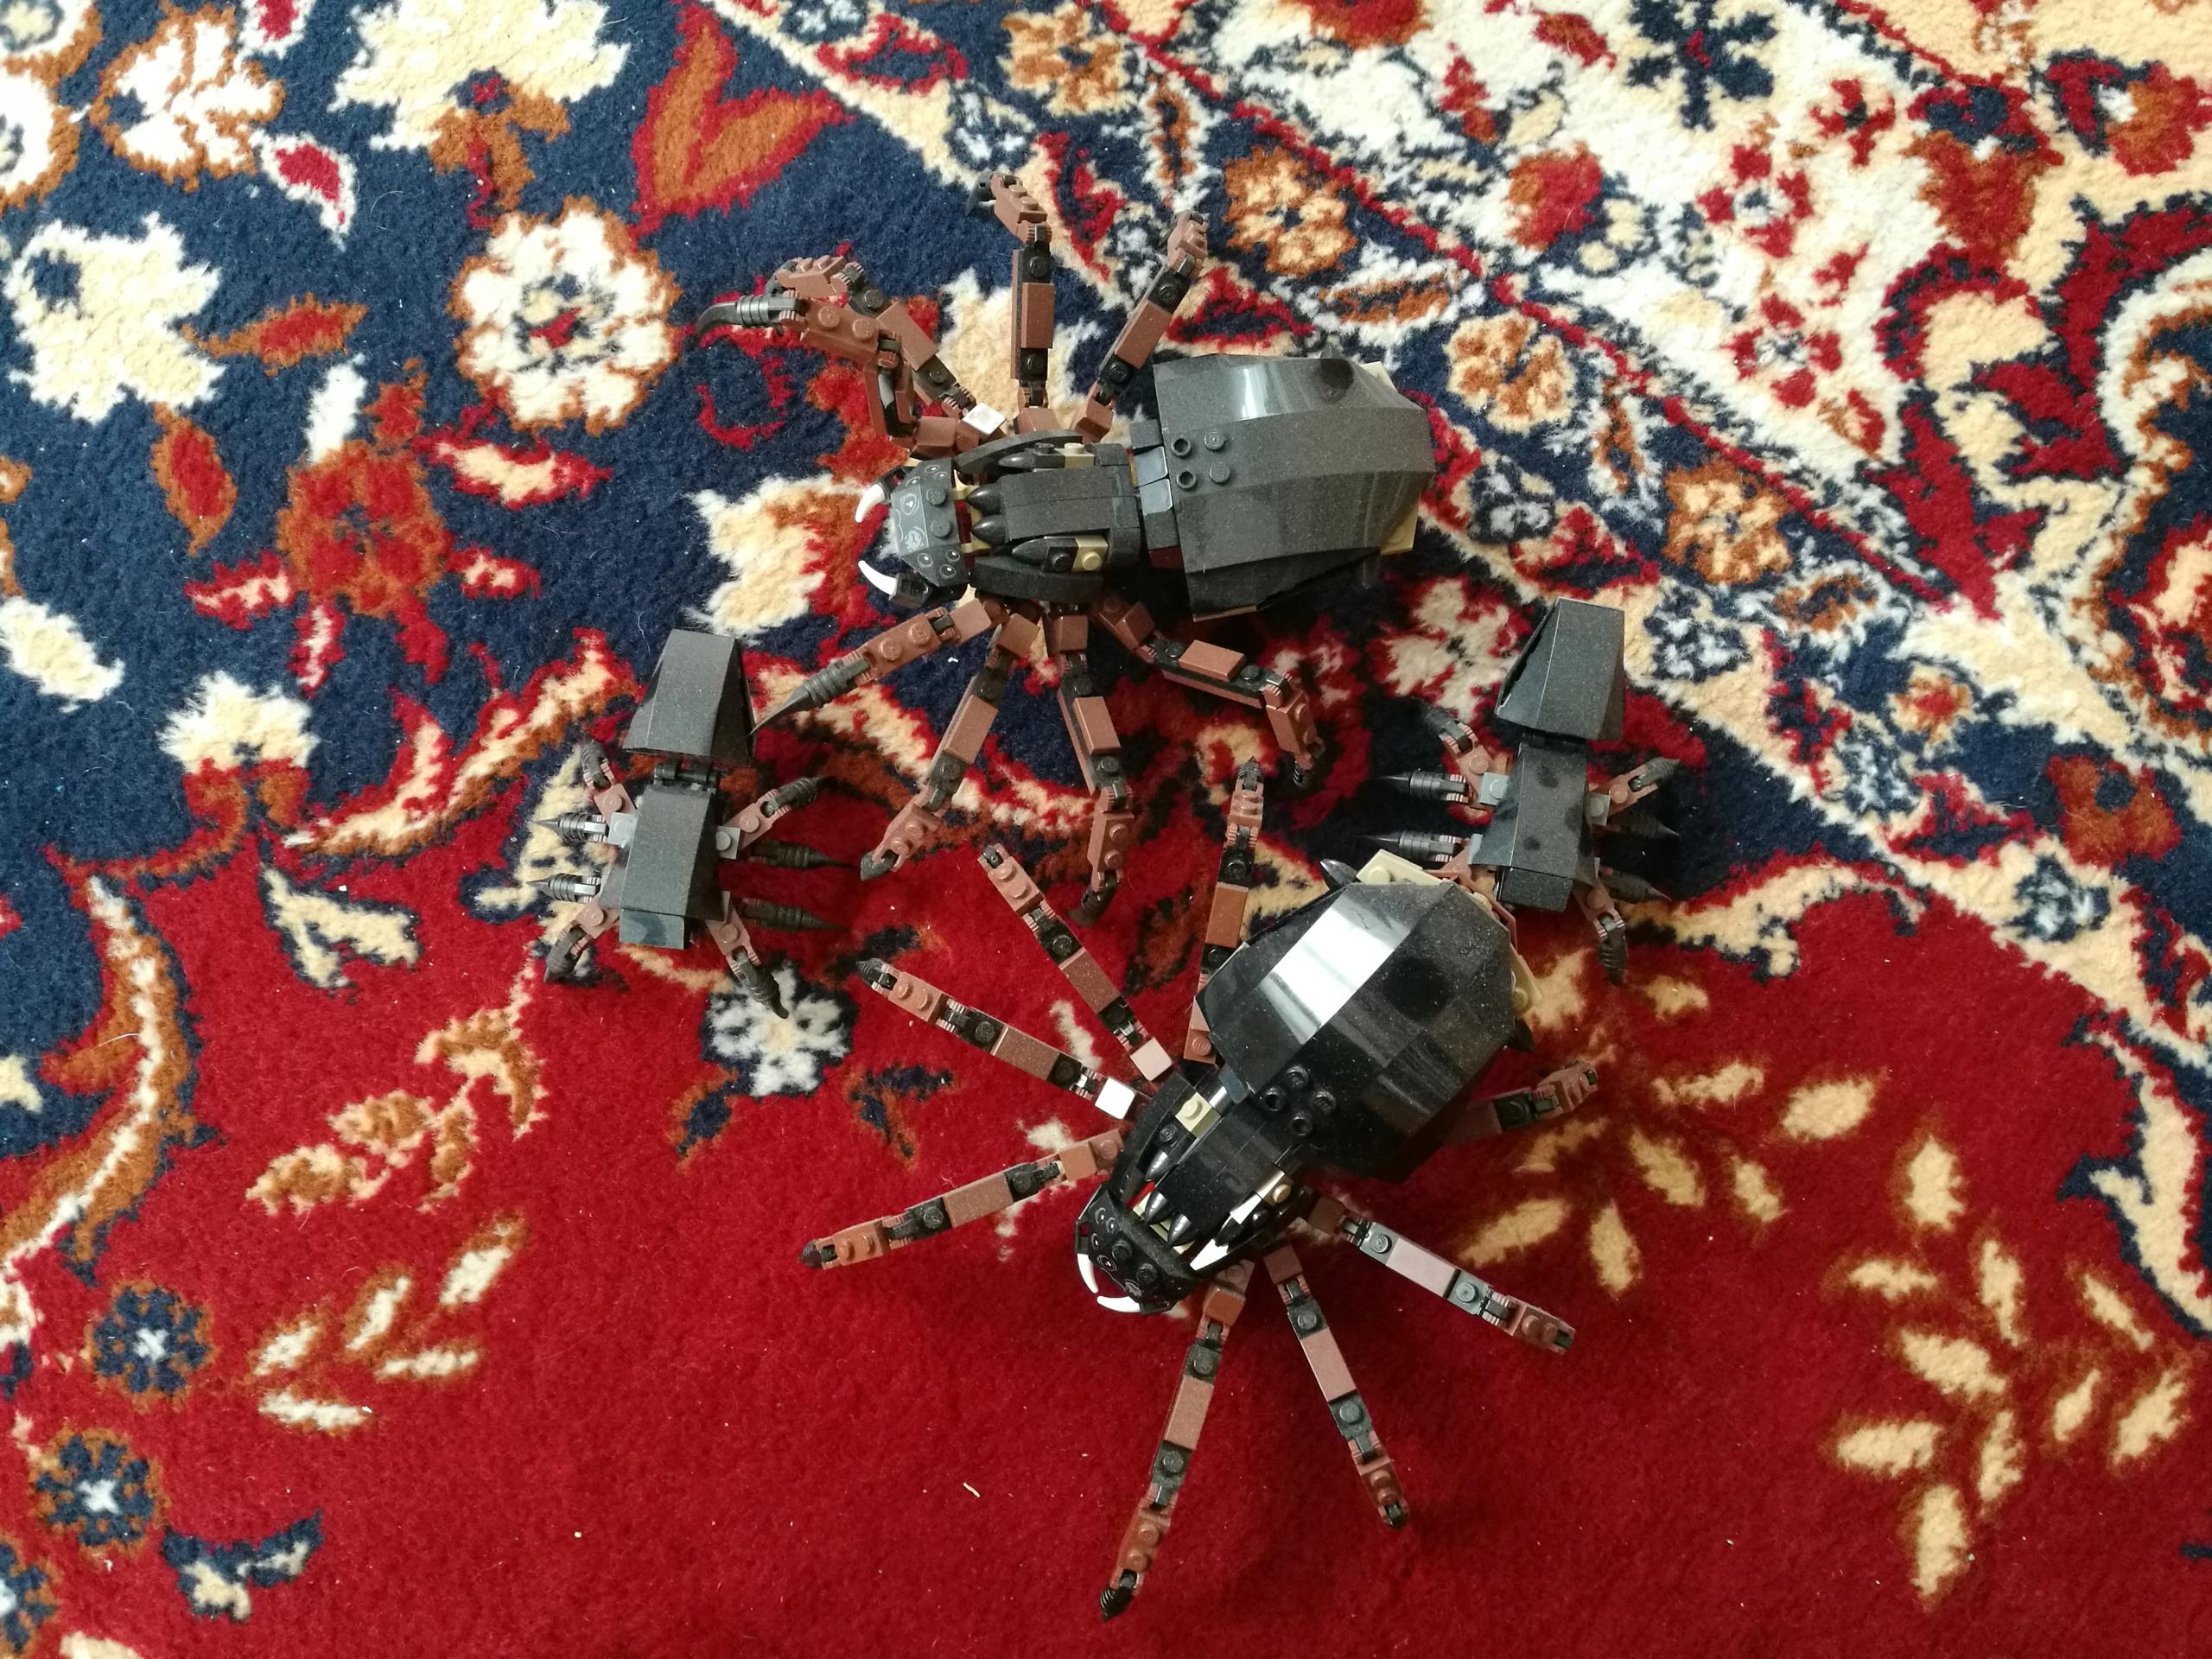 Lego Pająki Mirkwood i Sheloby